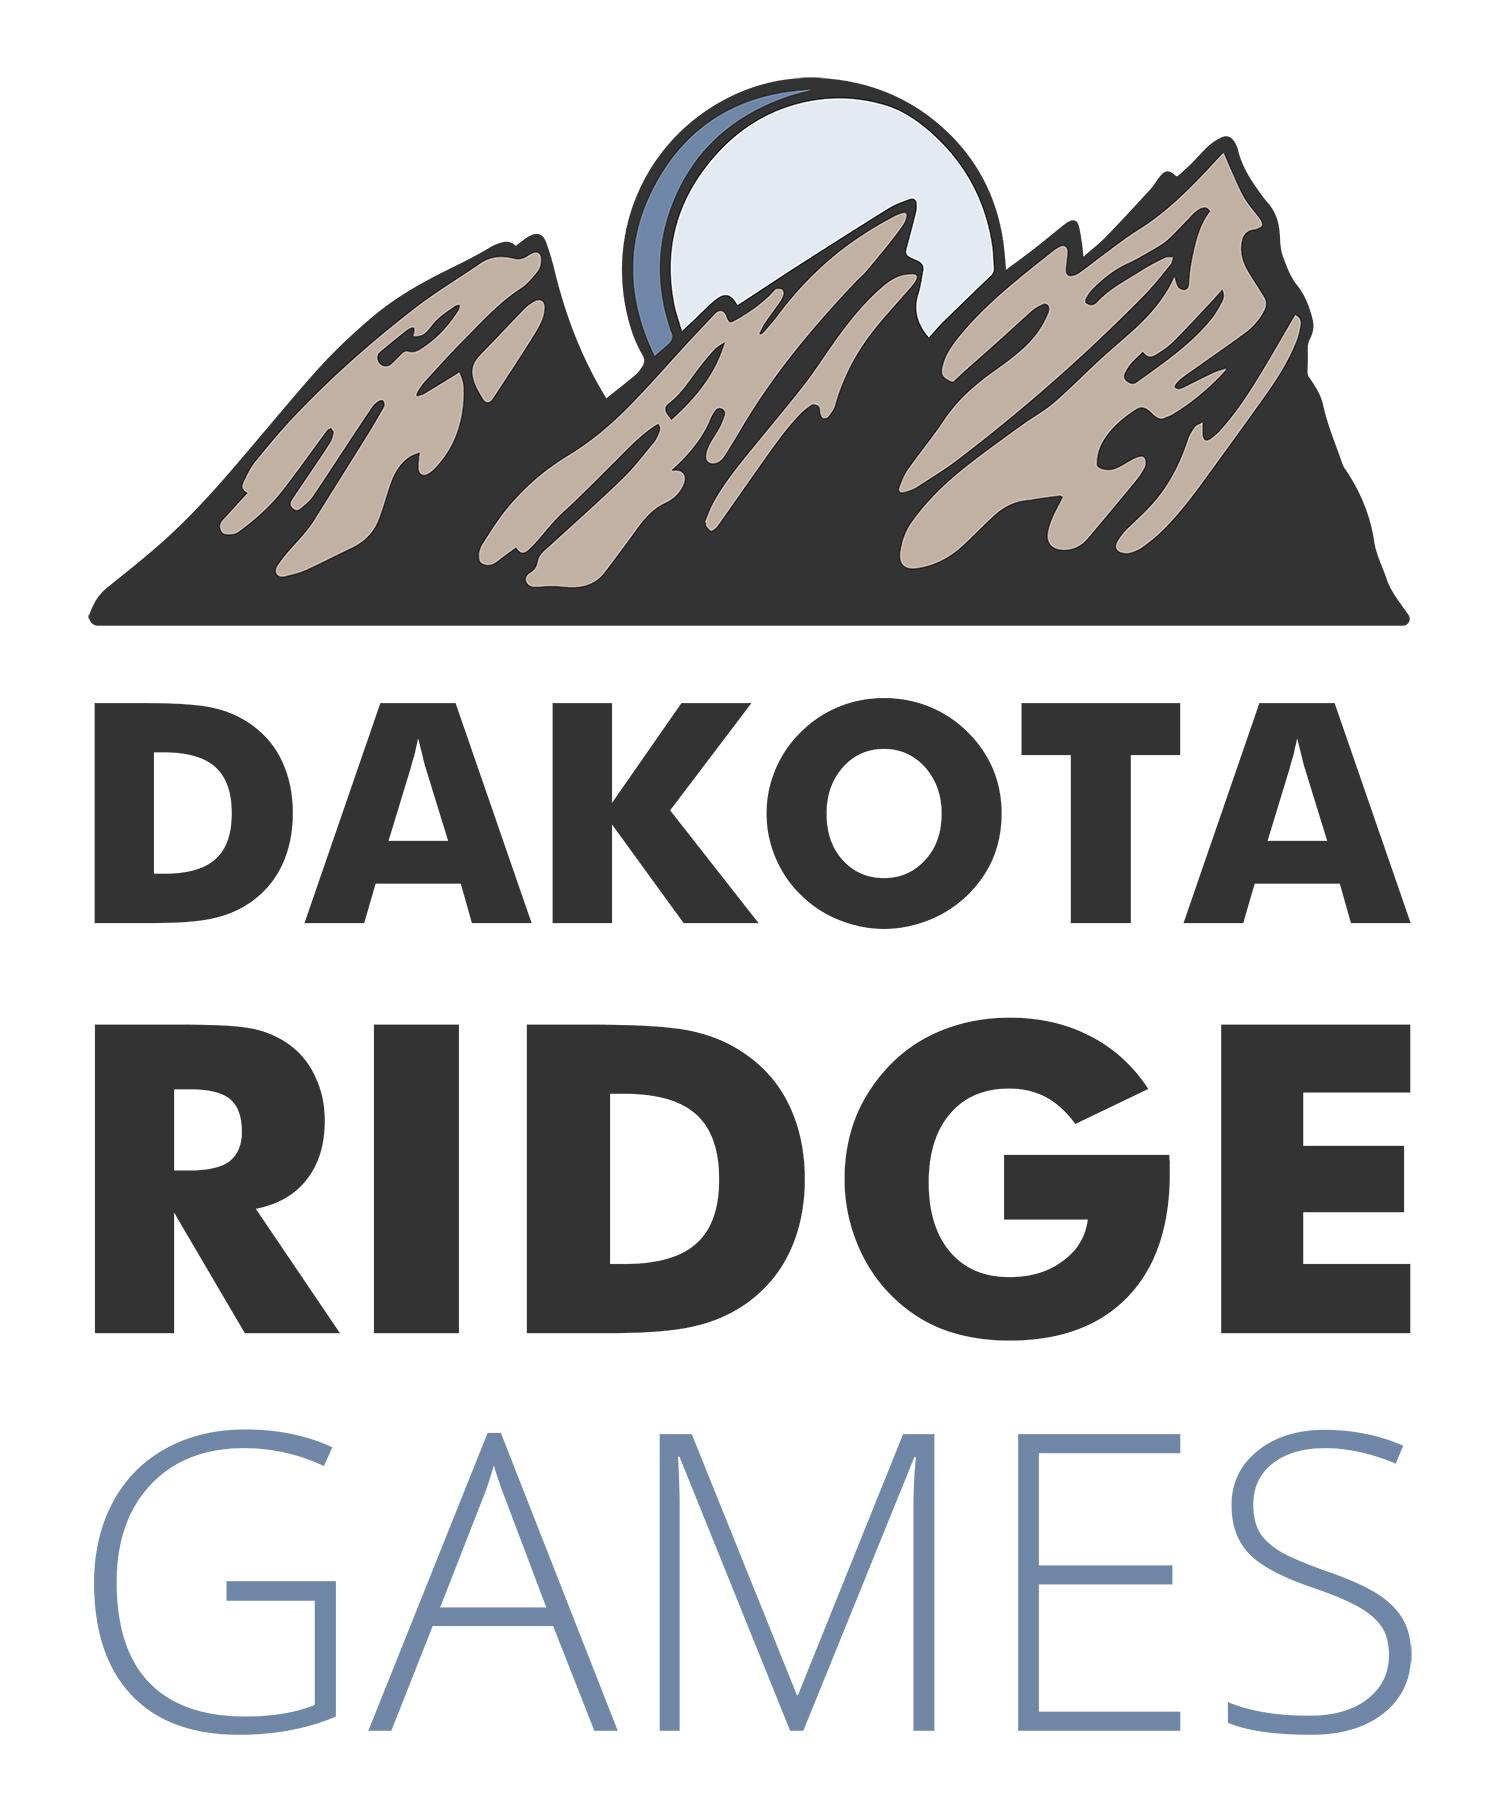 Dakota Ridge Games Has the Best Open World Board Game